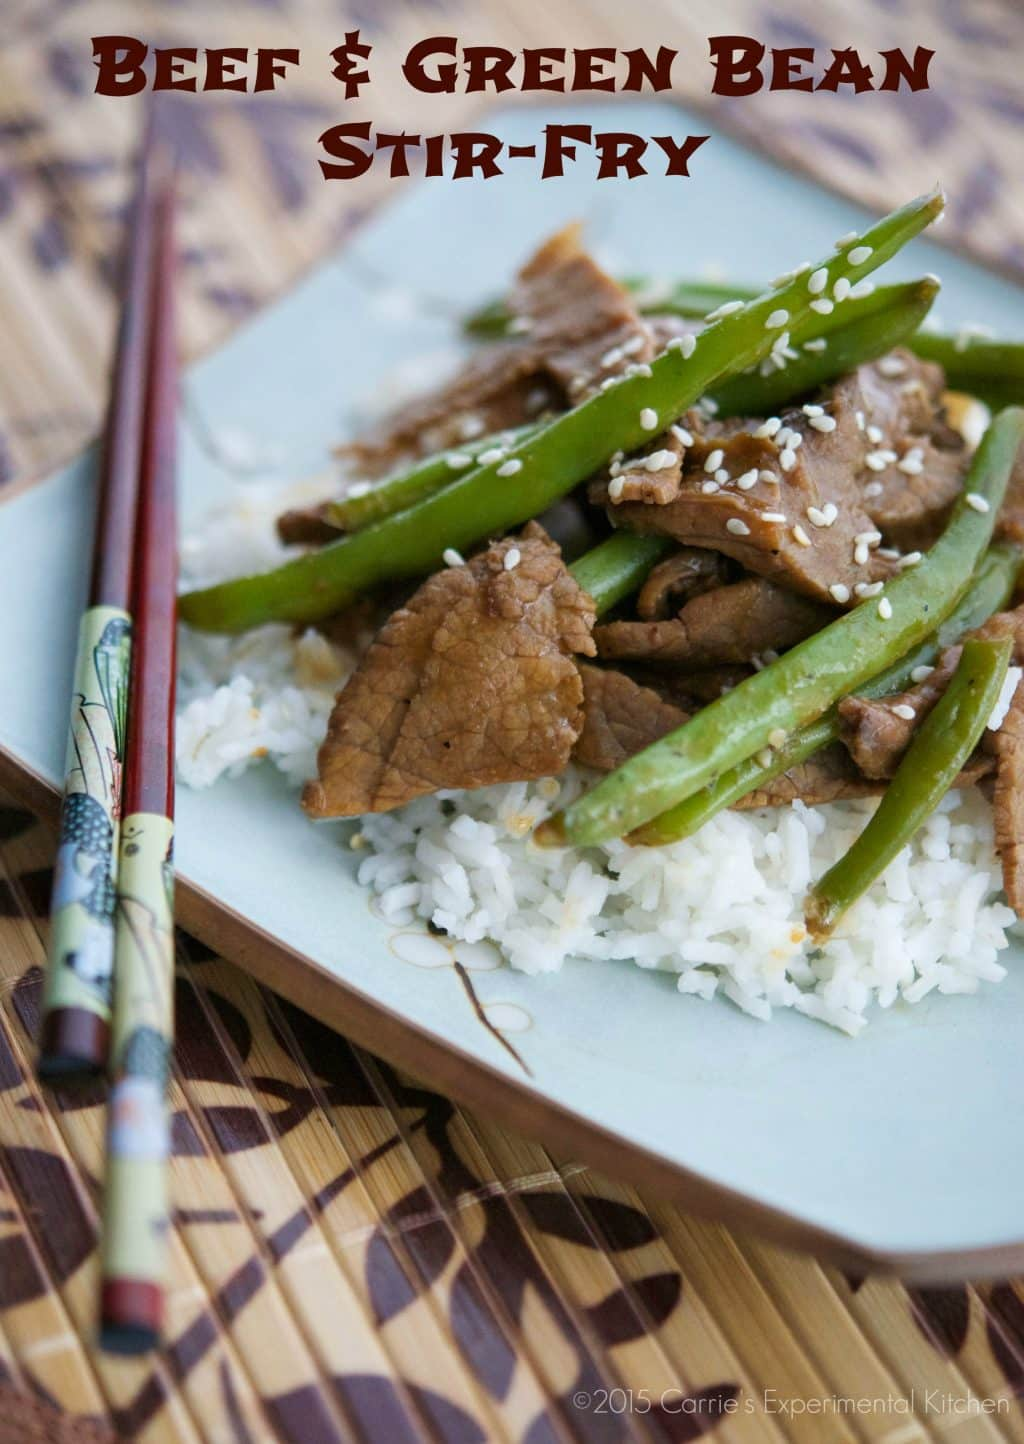 Beef & Green Bean Stir Fry | Carrie's Experimental Kitchen #beef #gluten free